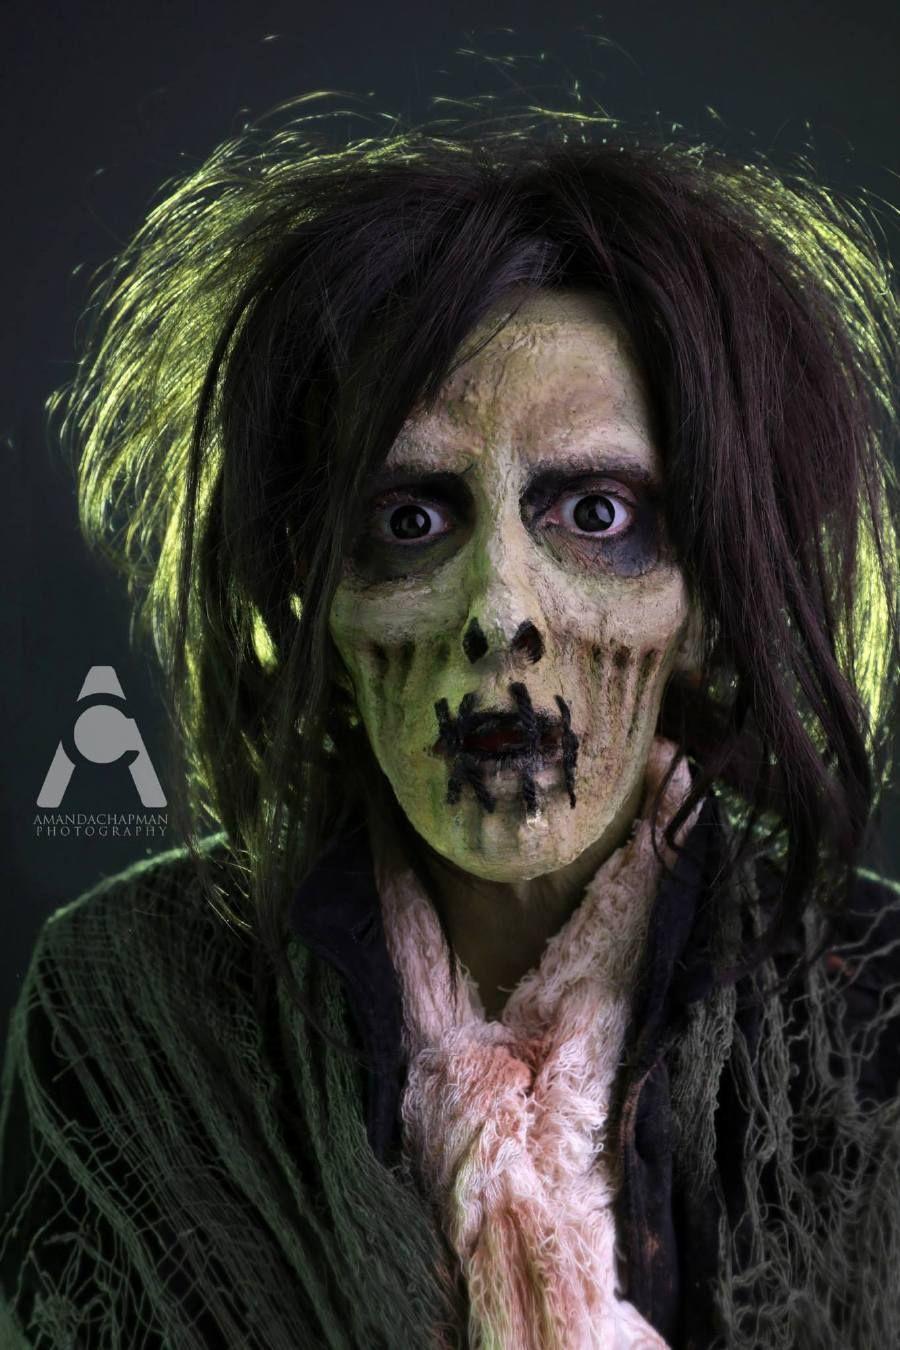 Amanda Chapman 31 Days Of Halloween 2020 23 Images of Epic Halloween Makeup and Photography by Amanda